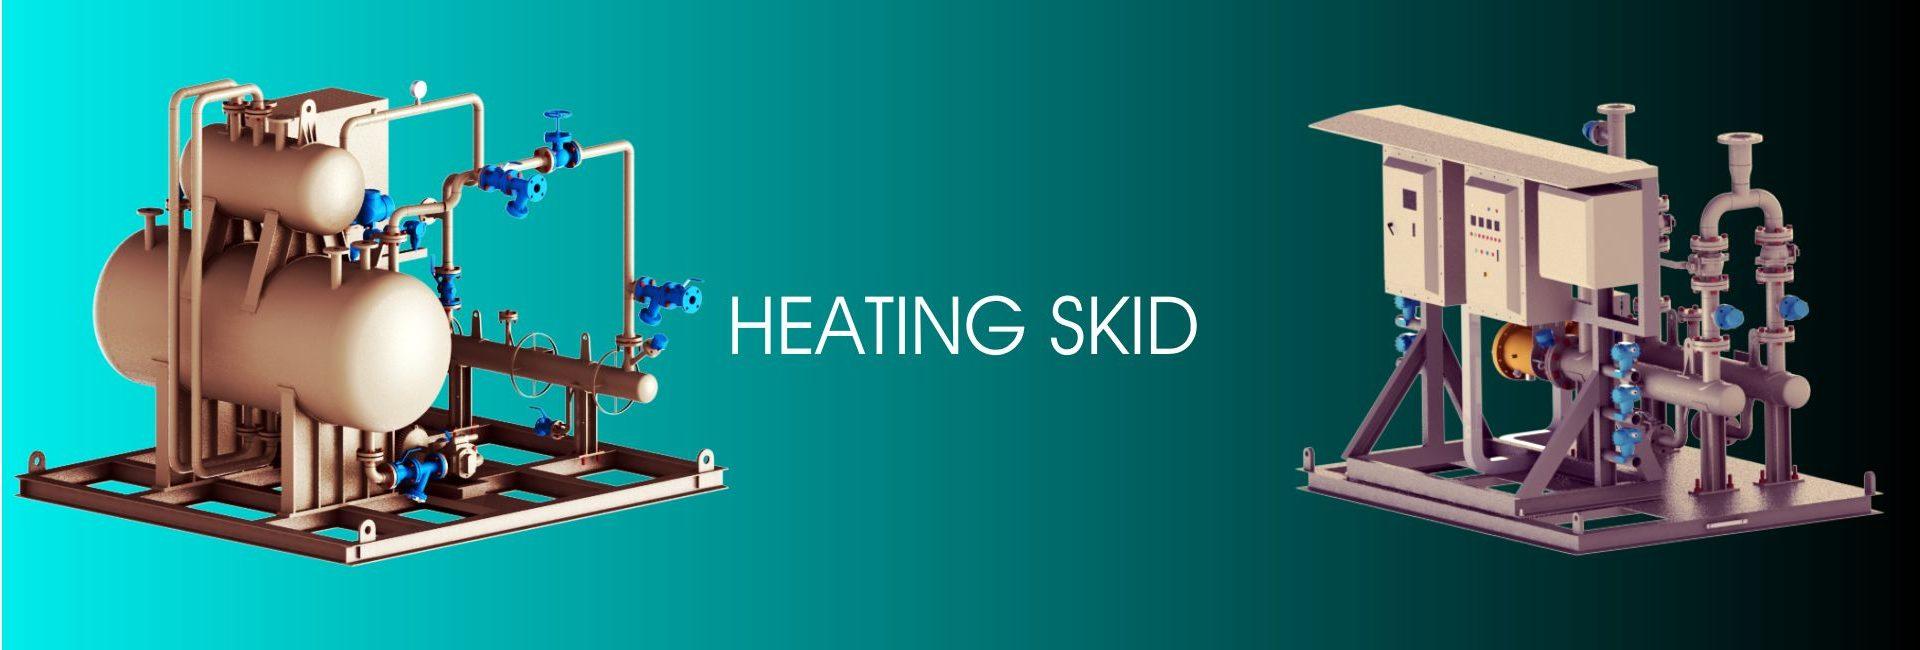 Heating skid